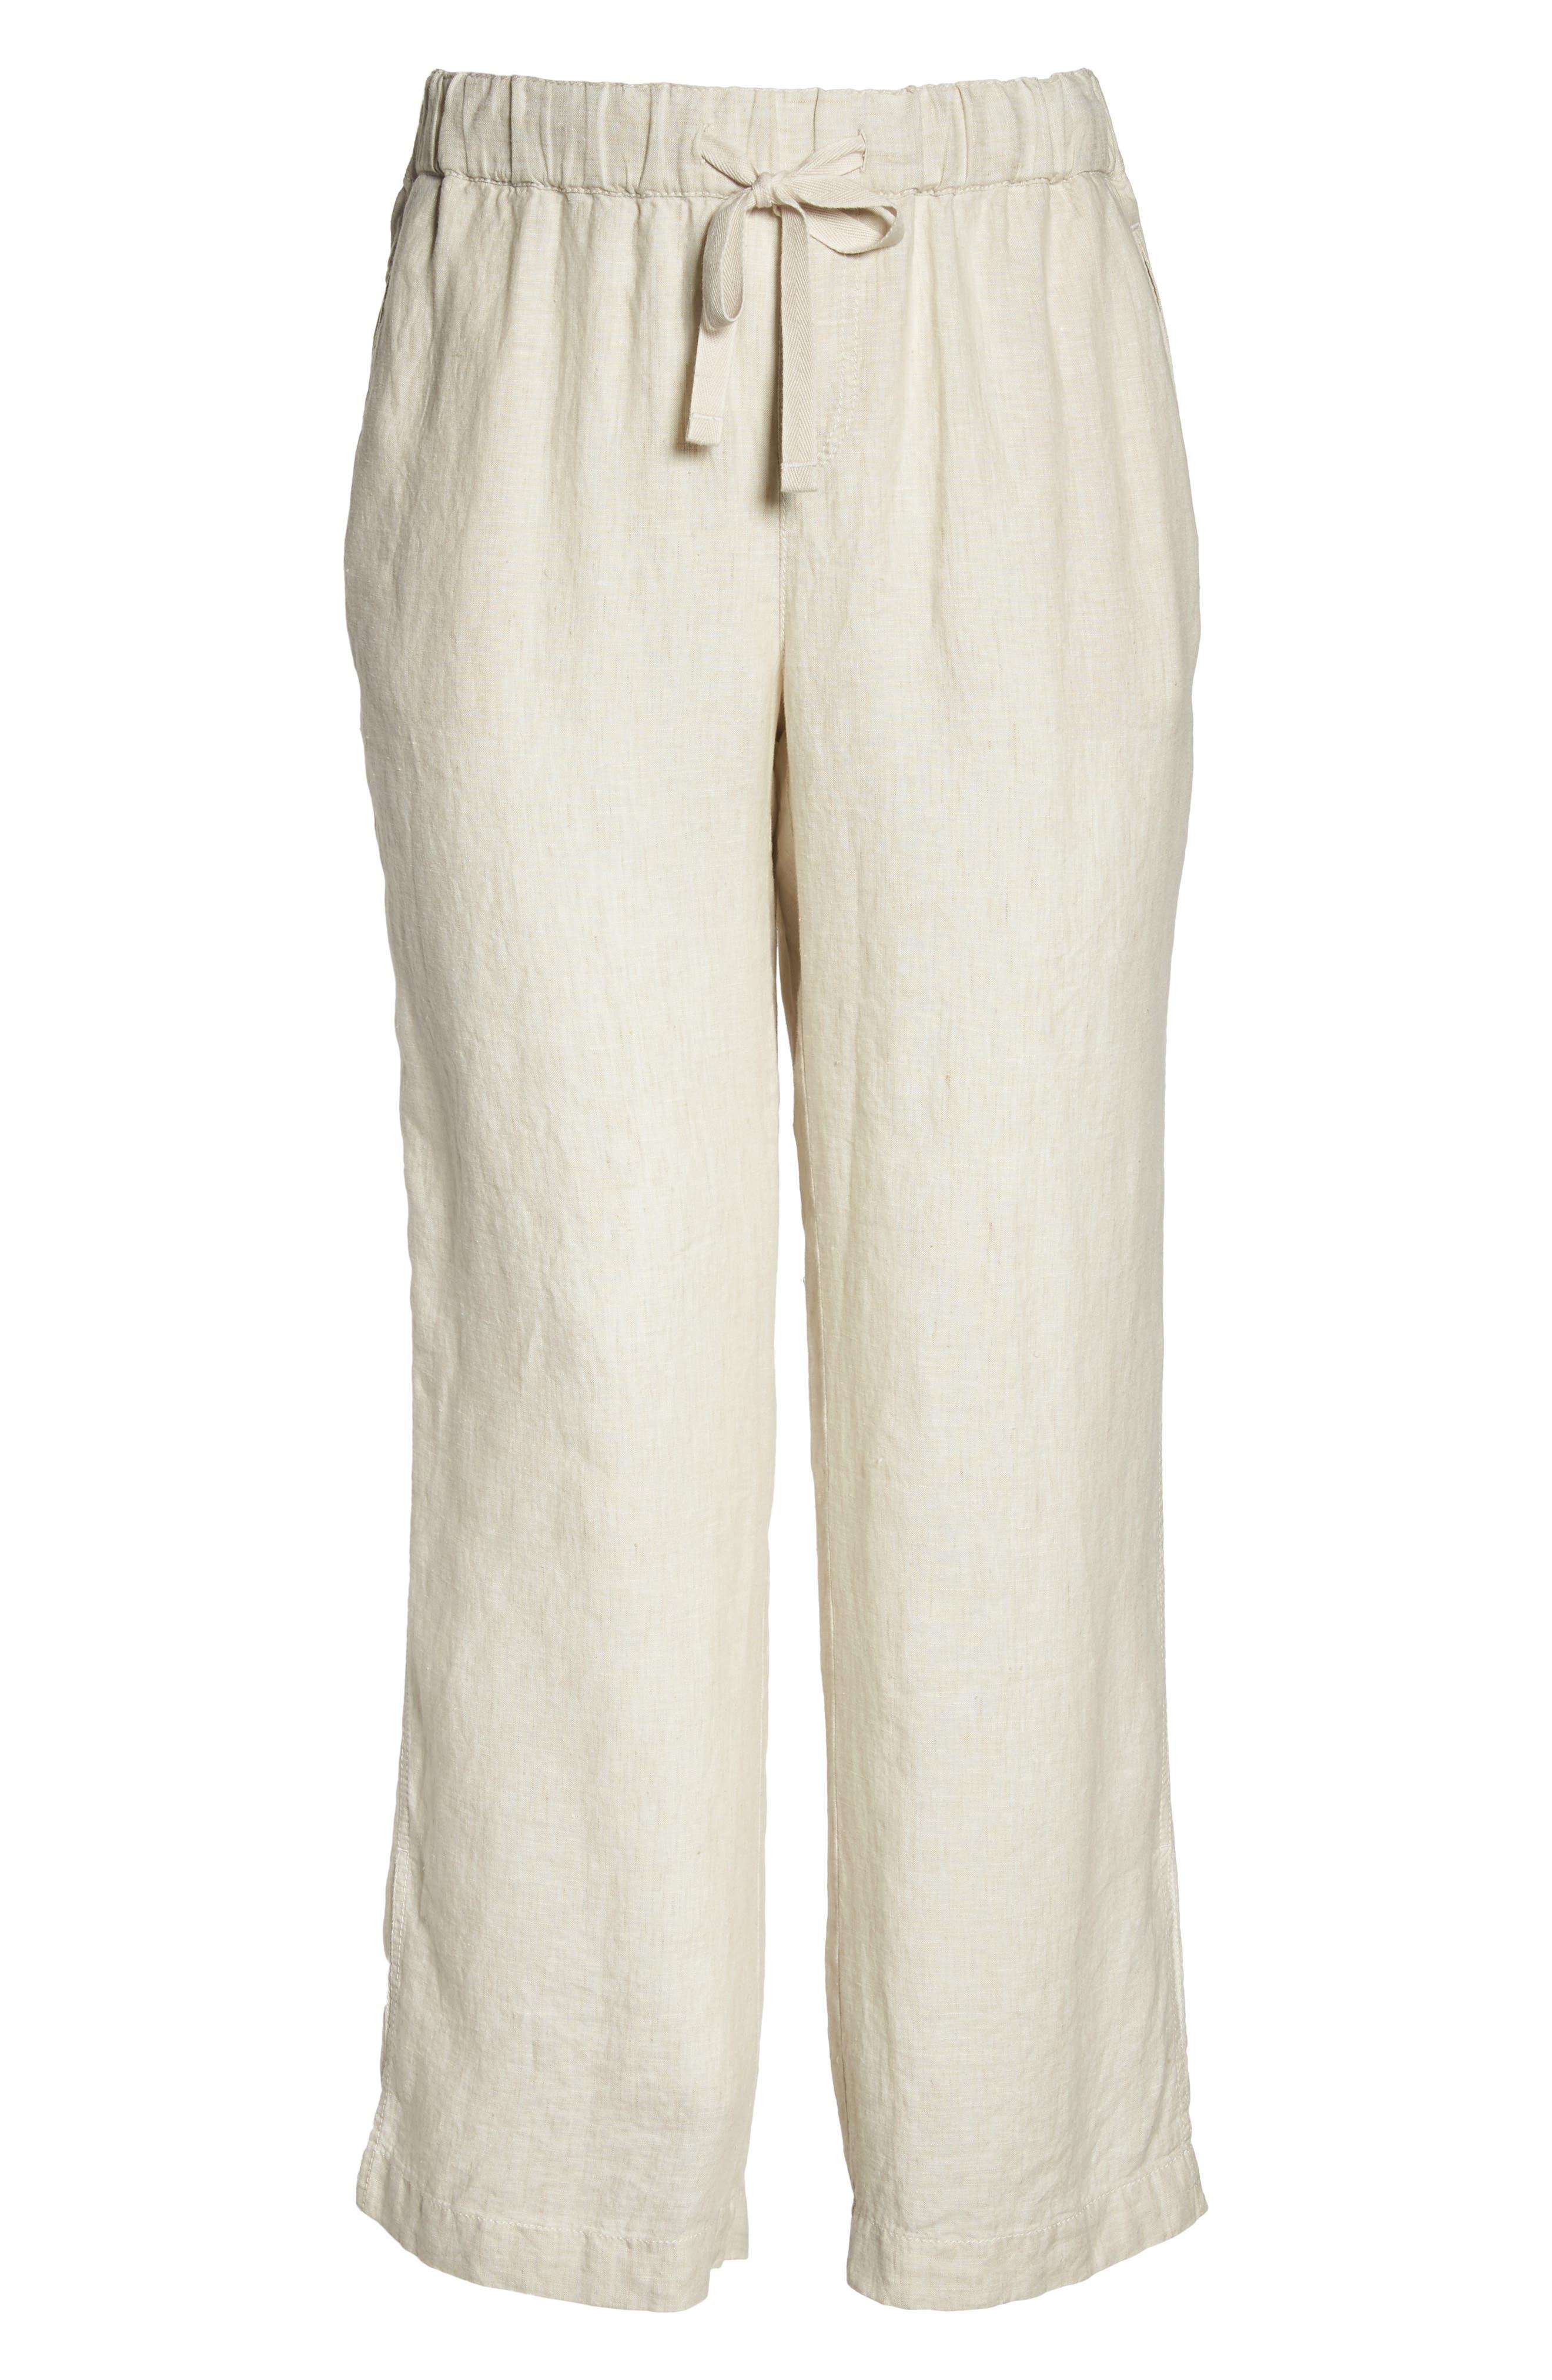 Linen Track Pants,                             Alternate thumbnail 6, color,                             Flax